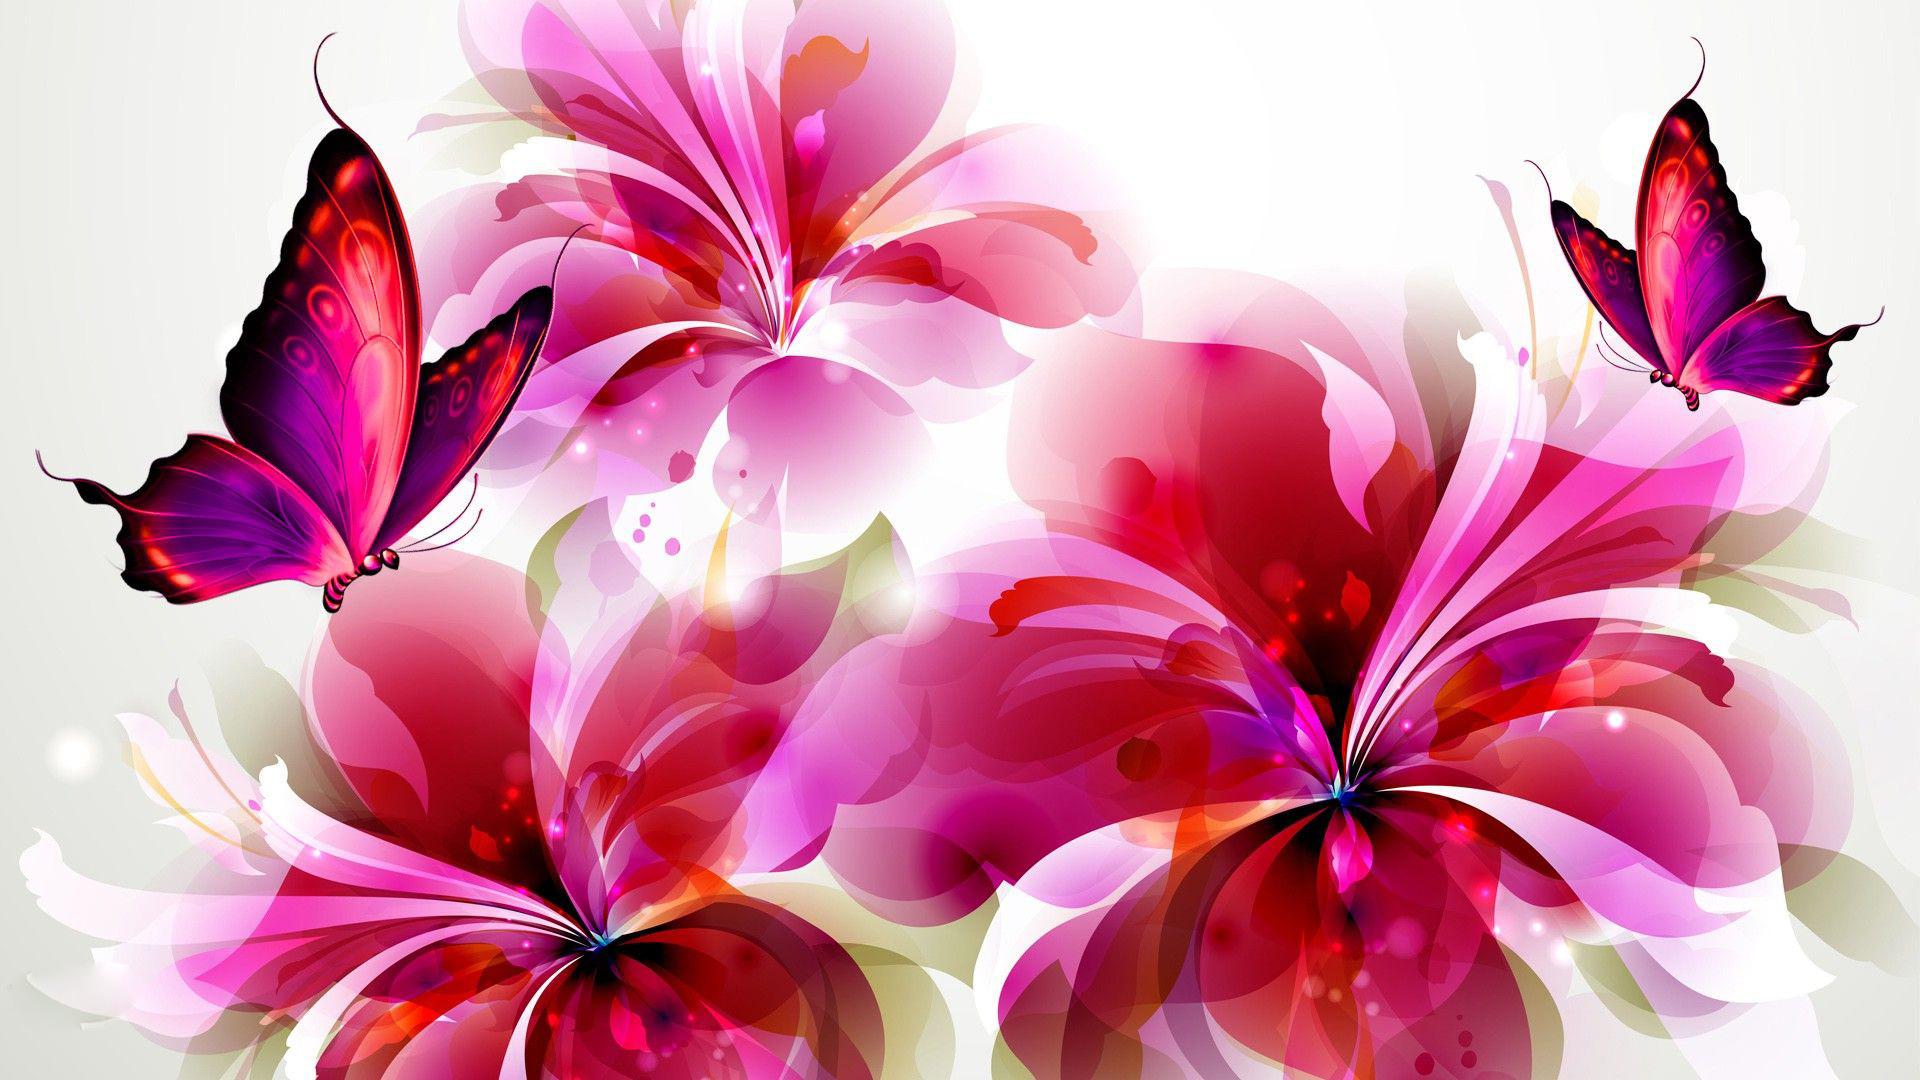 Butterfly And Flower Wallpaper - WallpaperSafari